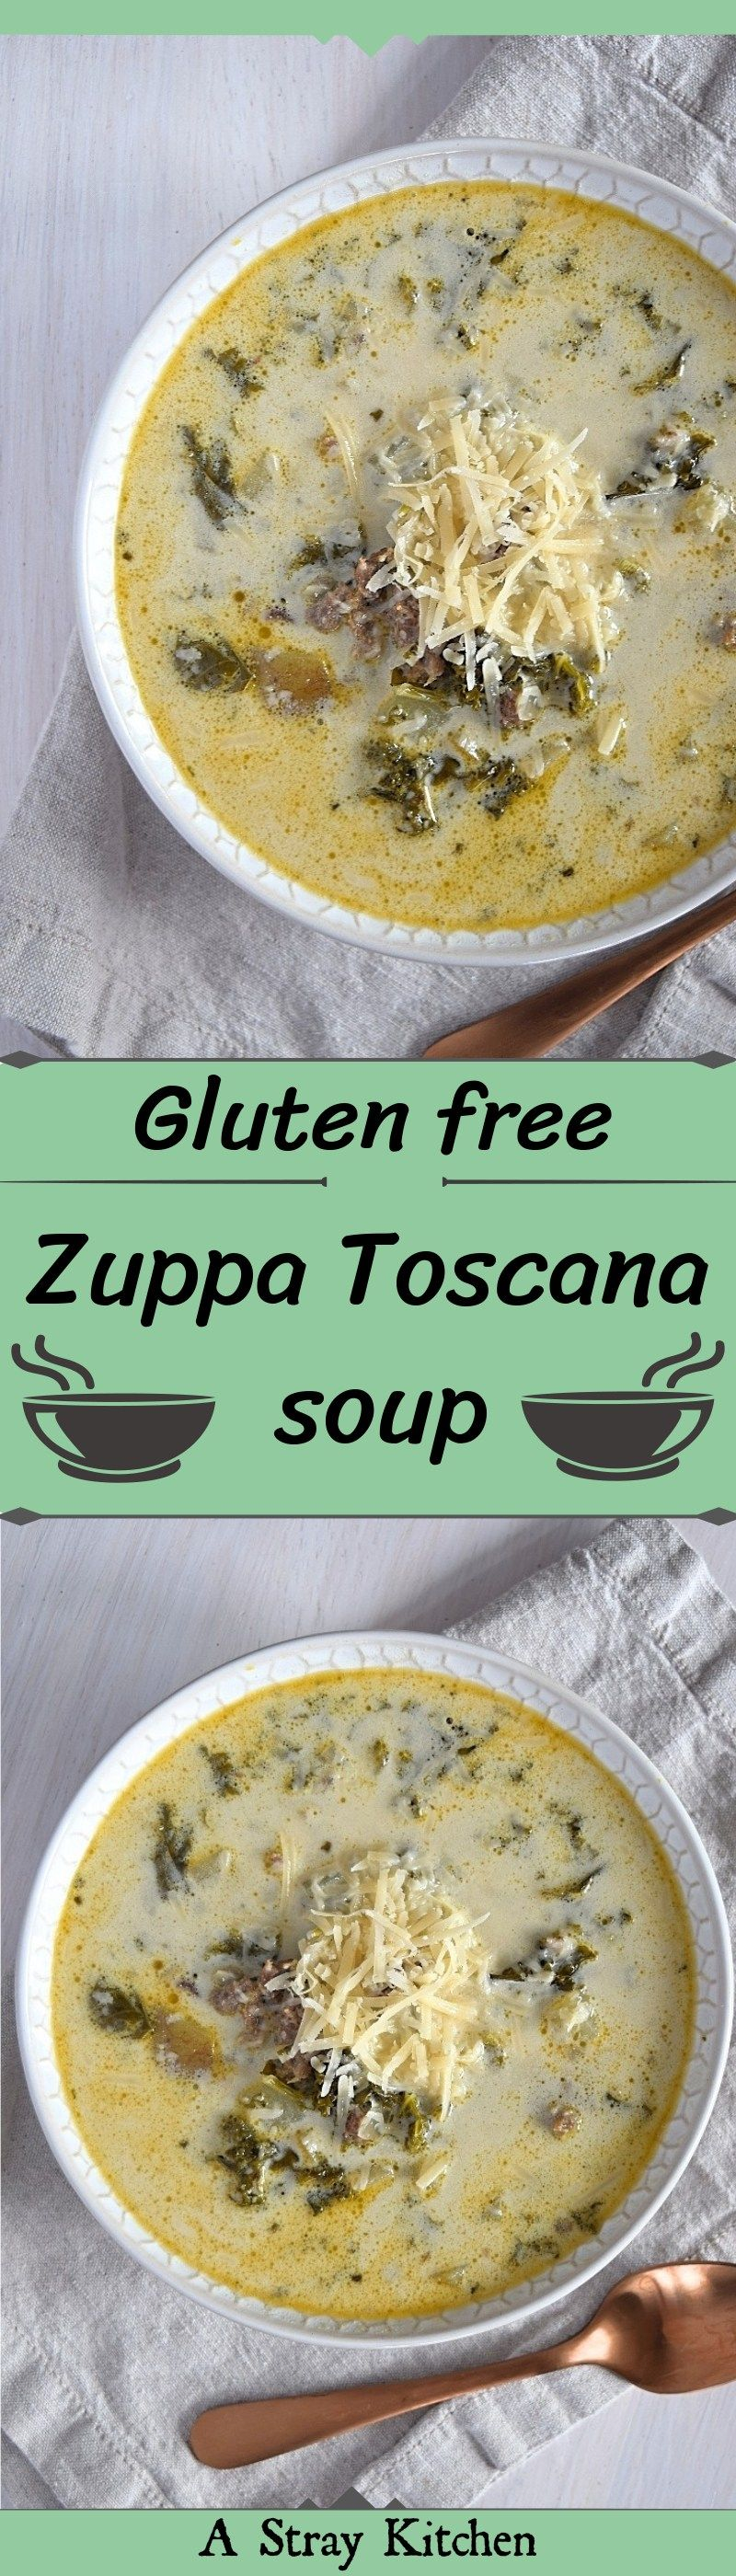 Zuppa Toscana Soup #zuppatoscanasoup